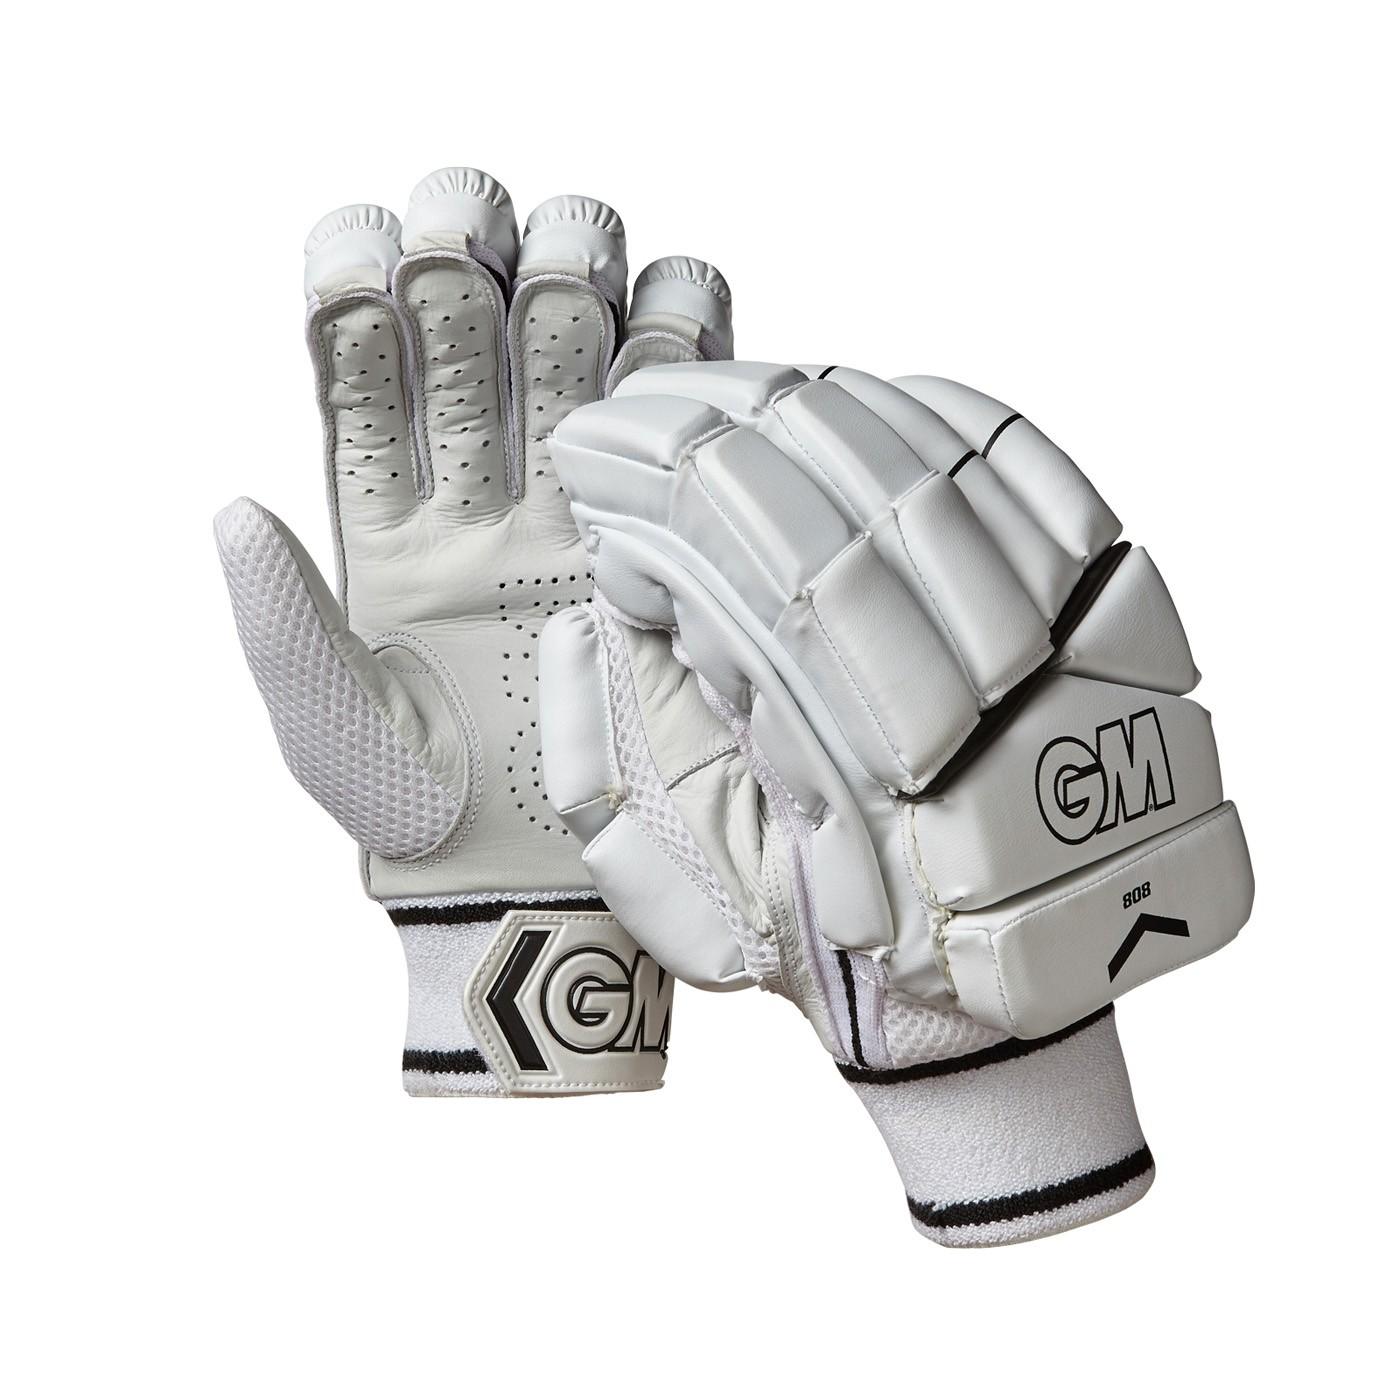 2021 Gunn and Moore 808 Batting Gloves